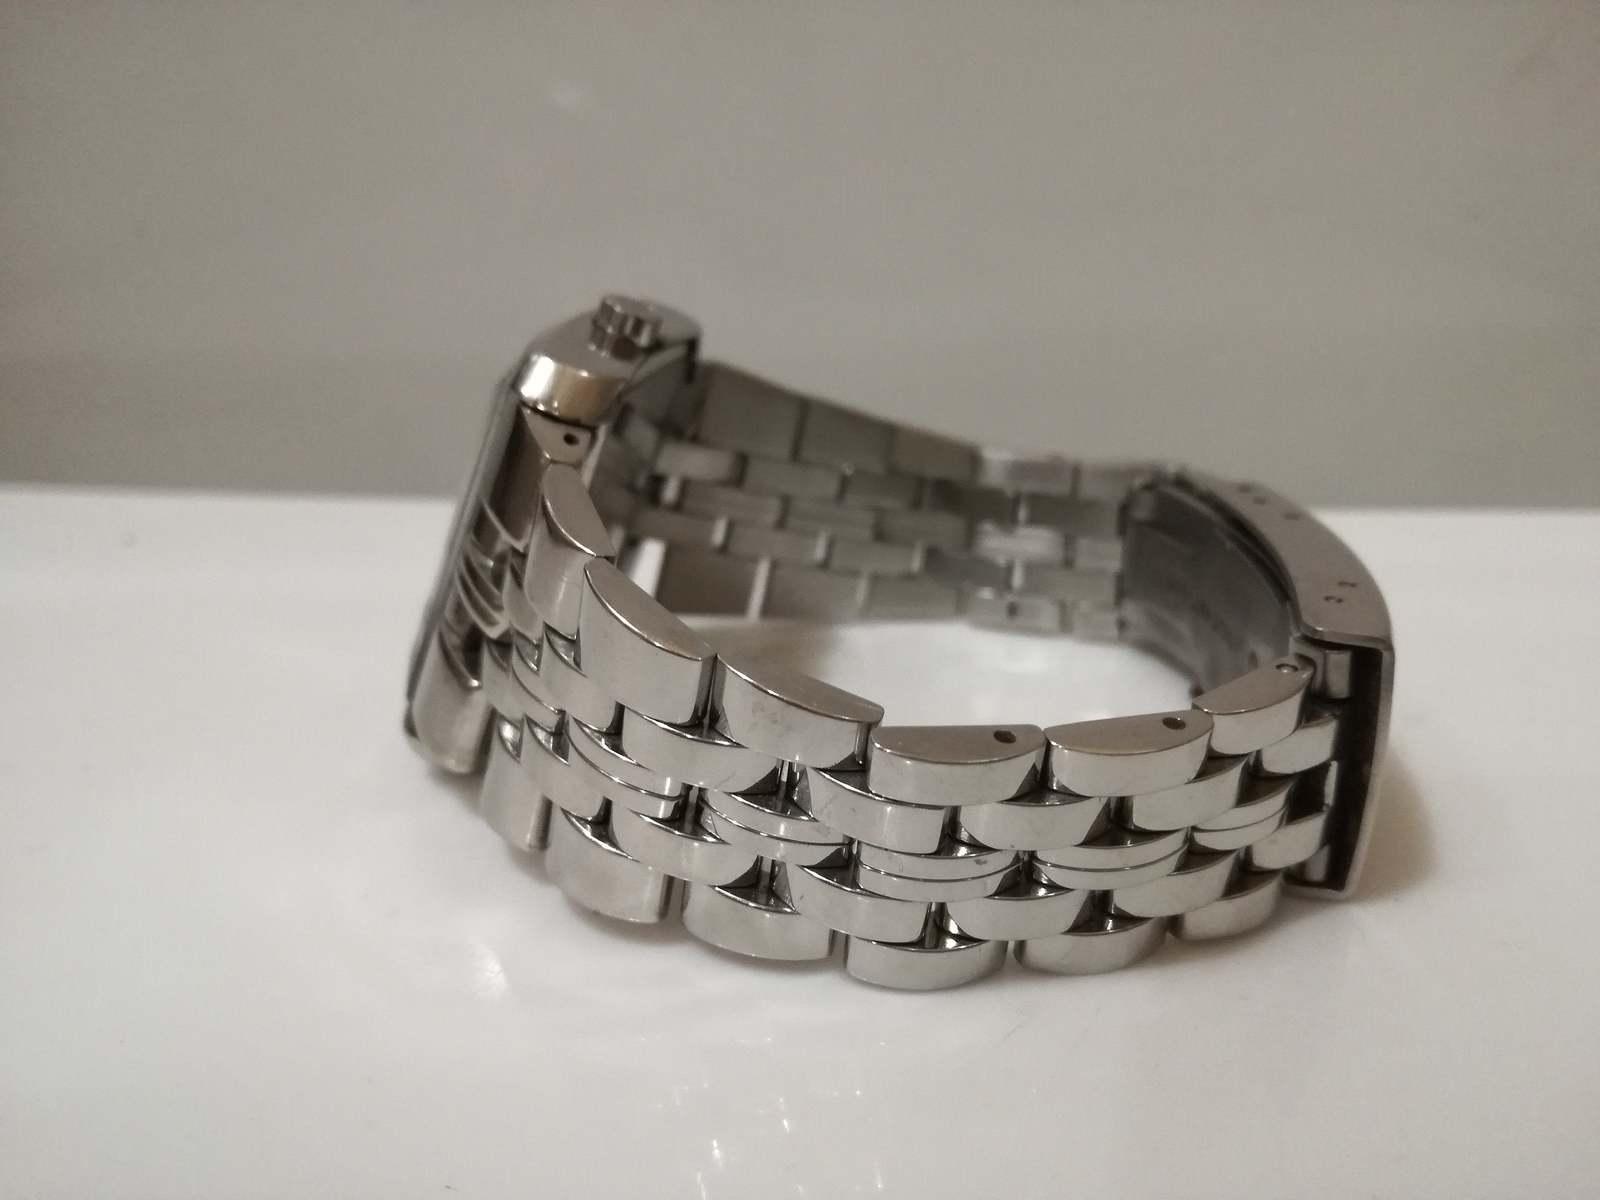 unisex Dress watch /   Police watch / quart watch / metal watch / vintage ladies image 5